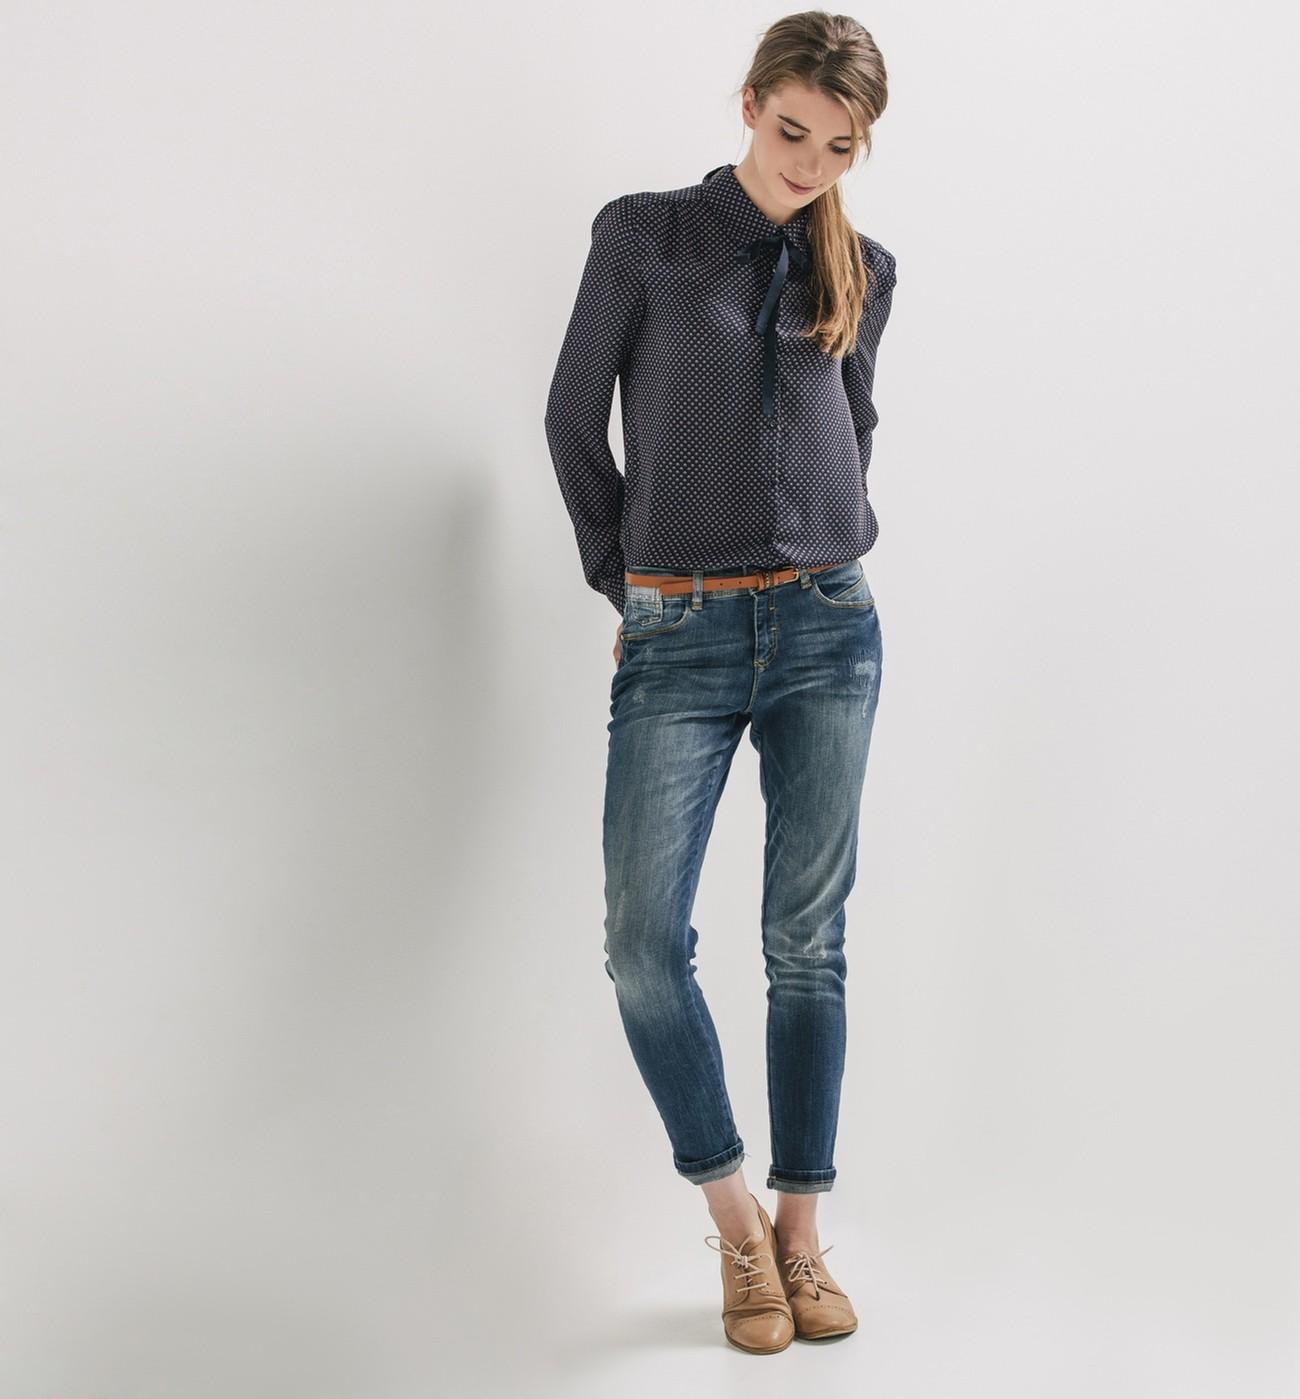 blazer jean toujours styl. Black Bedroom Furniture Sets. Home Design Ideas